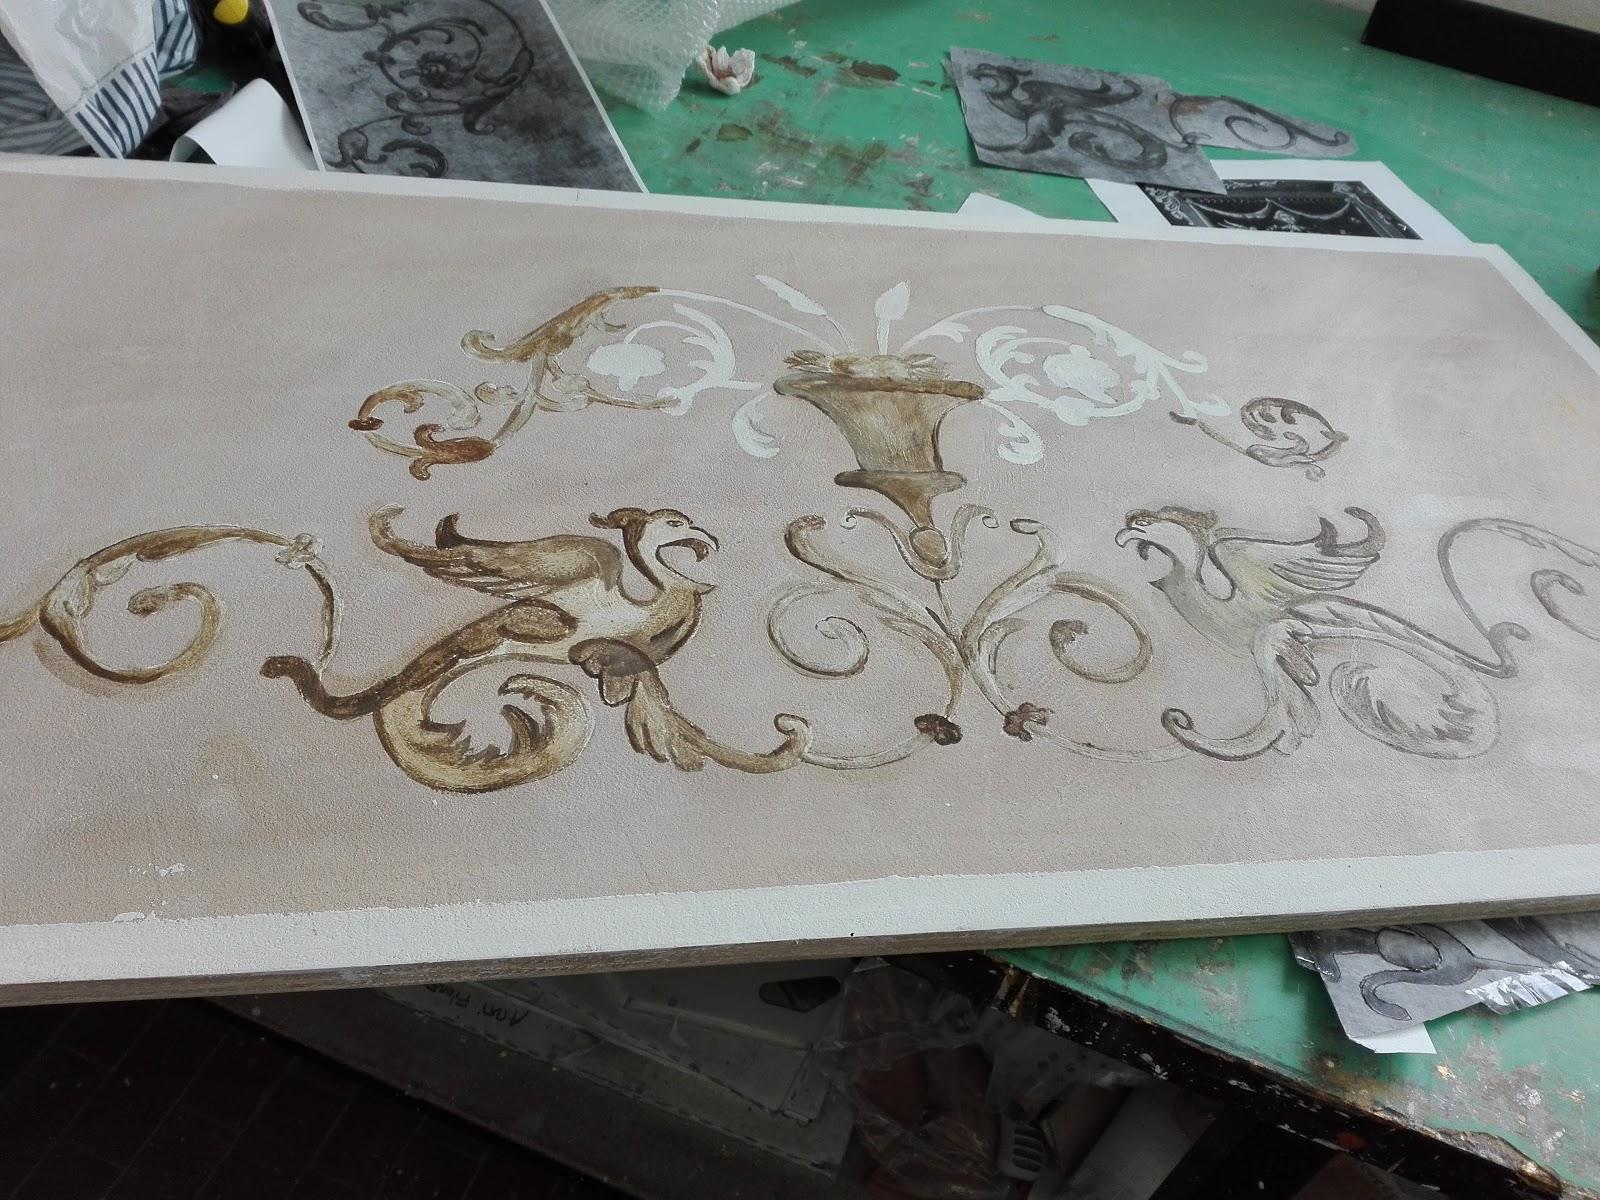 Arti Fiorentine creazioni artistiche, artistic creations. Made in ...